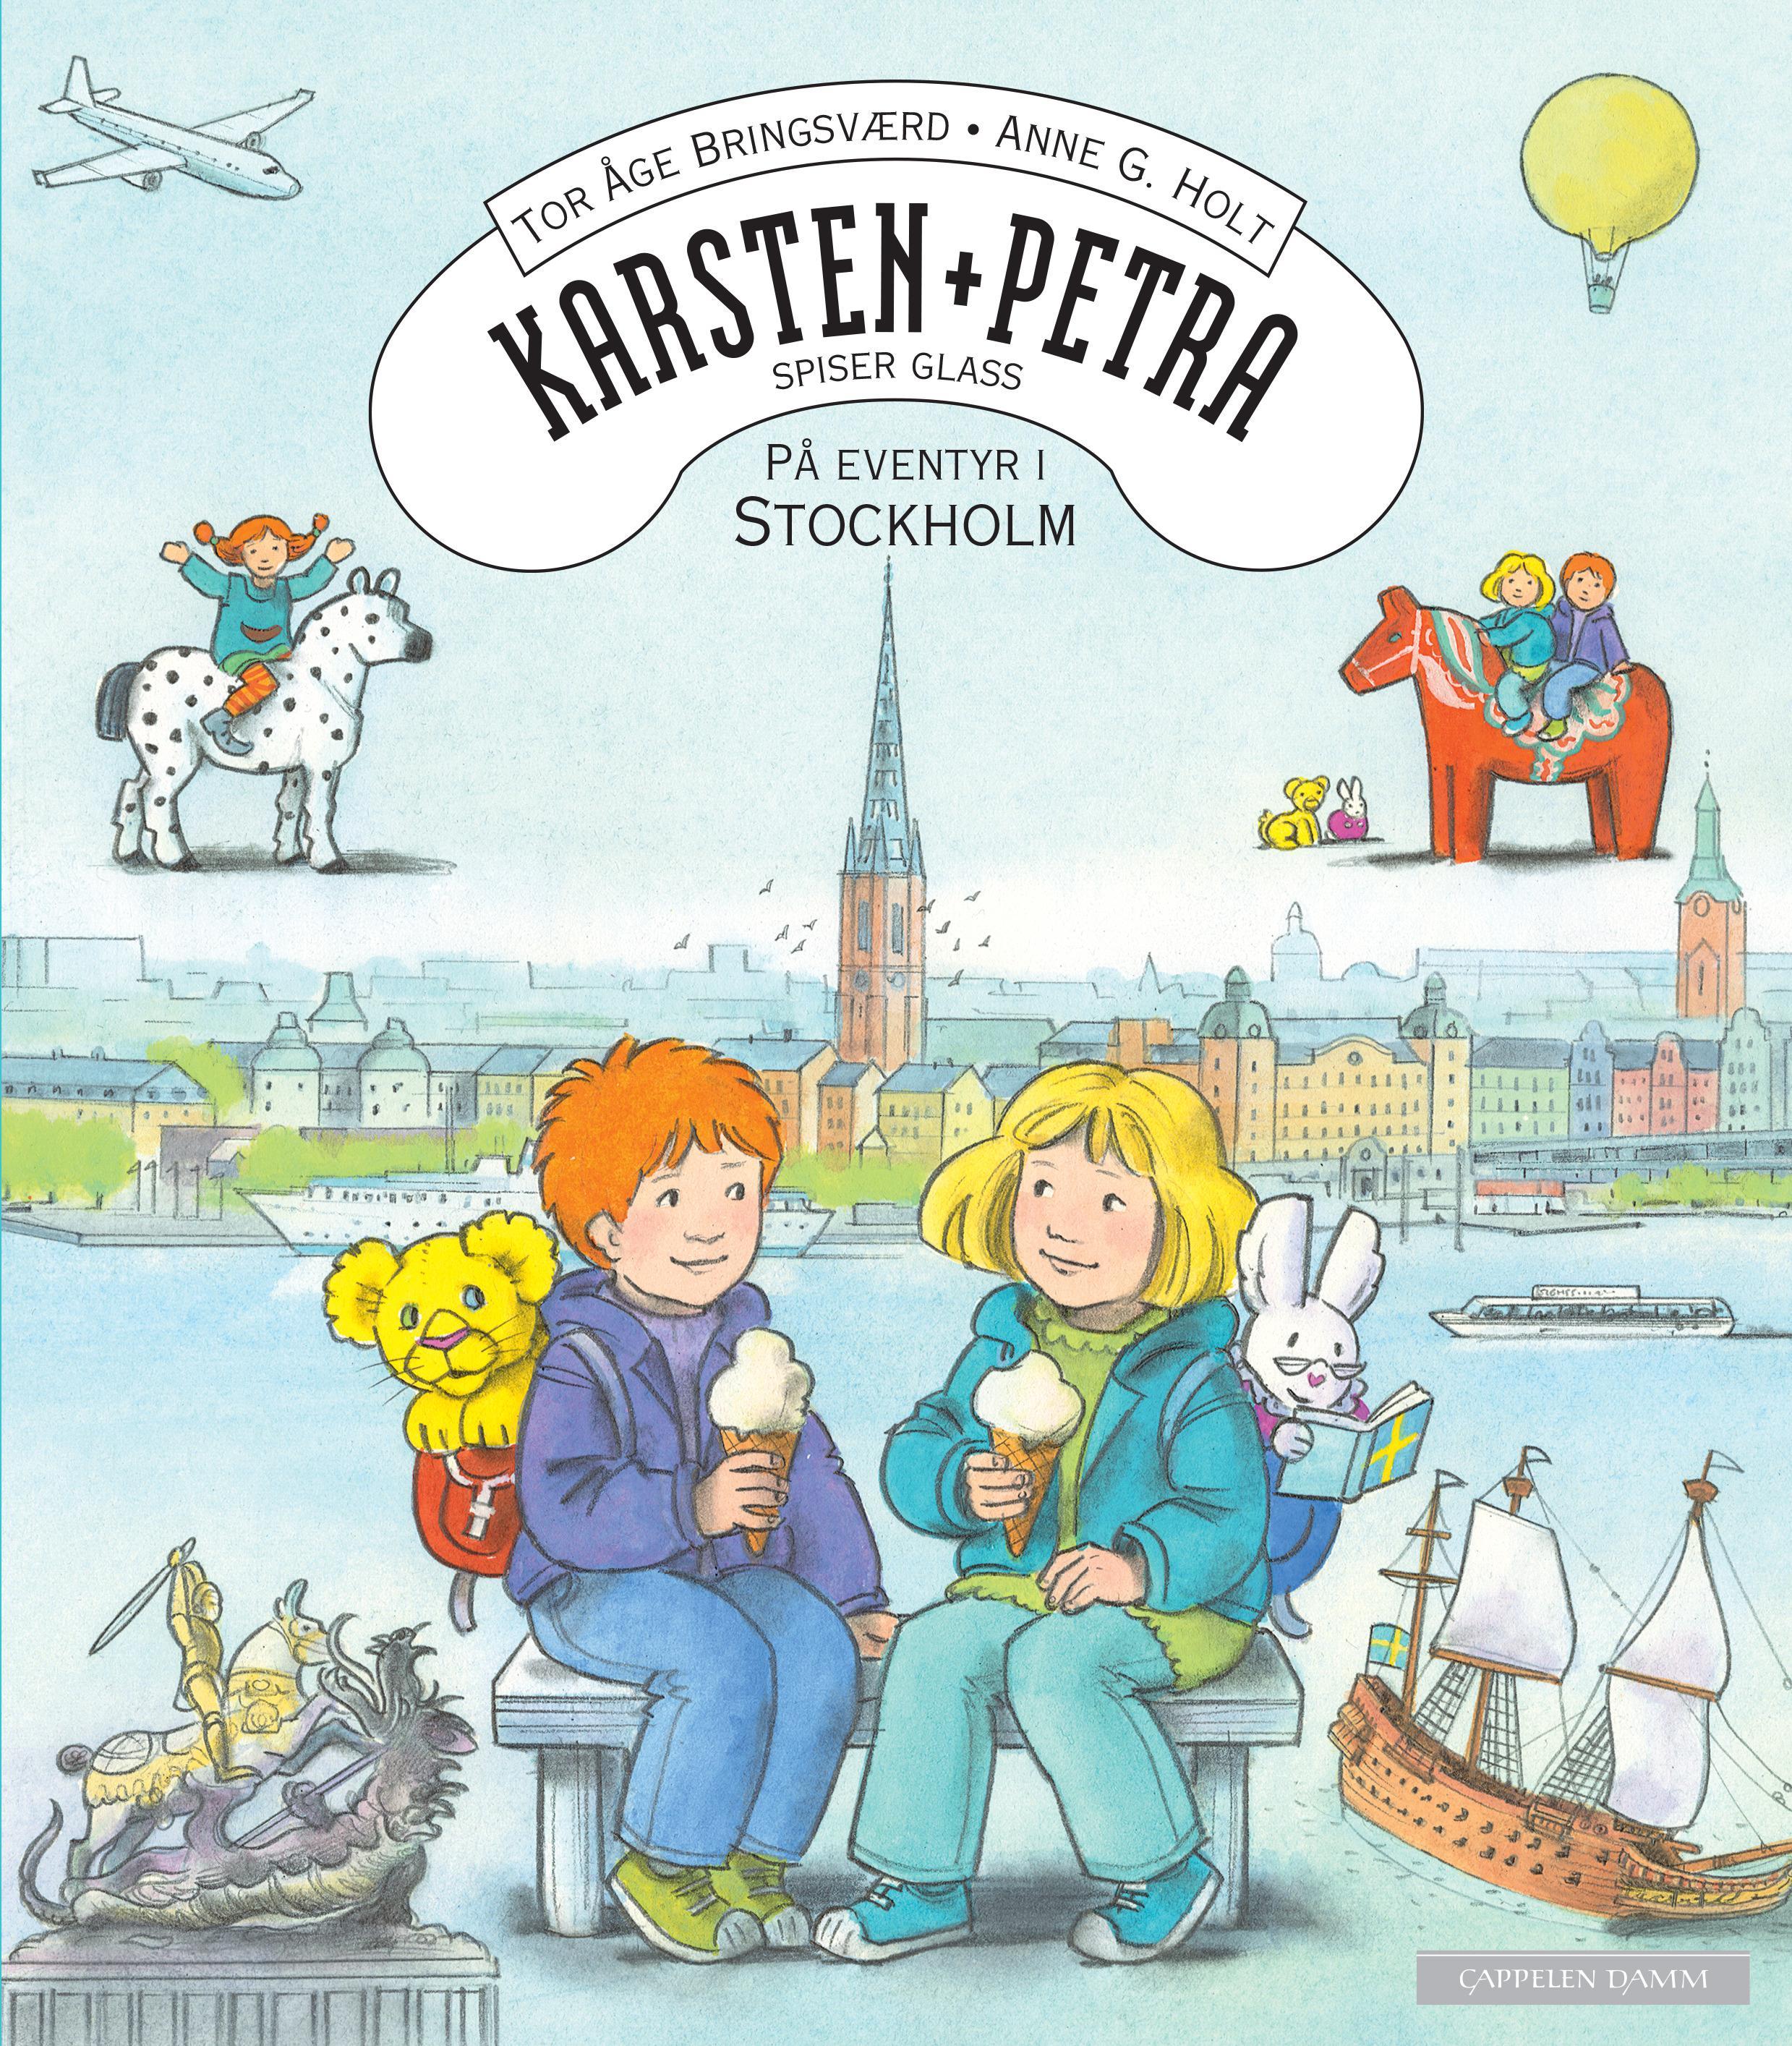 """Karsten og Petra spiser glass! - på eventyr i Stockholm"" av Tor Åge Bringsværd"